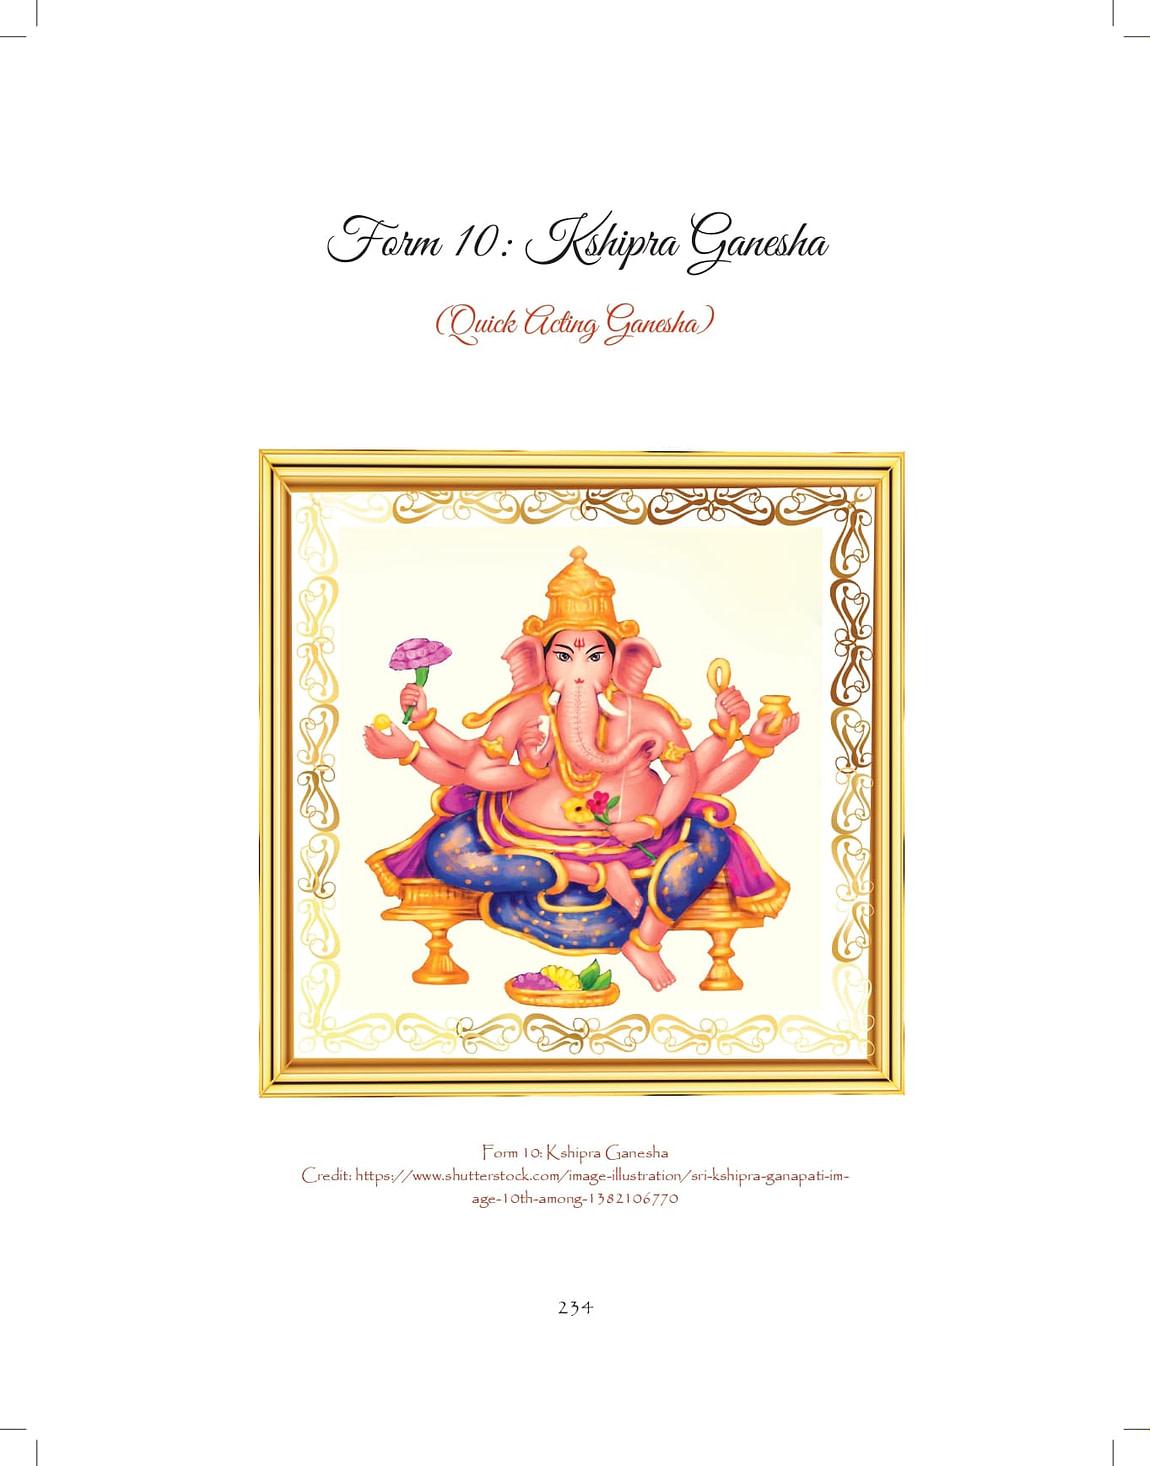 Ganesh-print_pages-to-jpg-0234.jpg